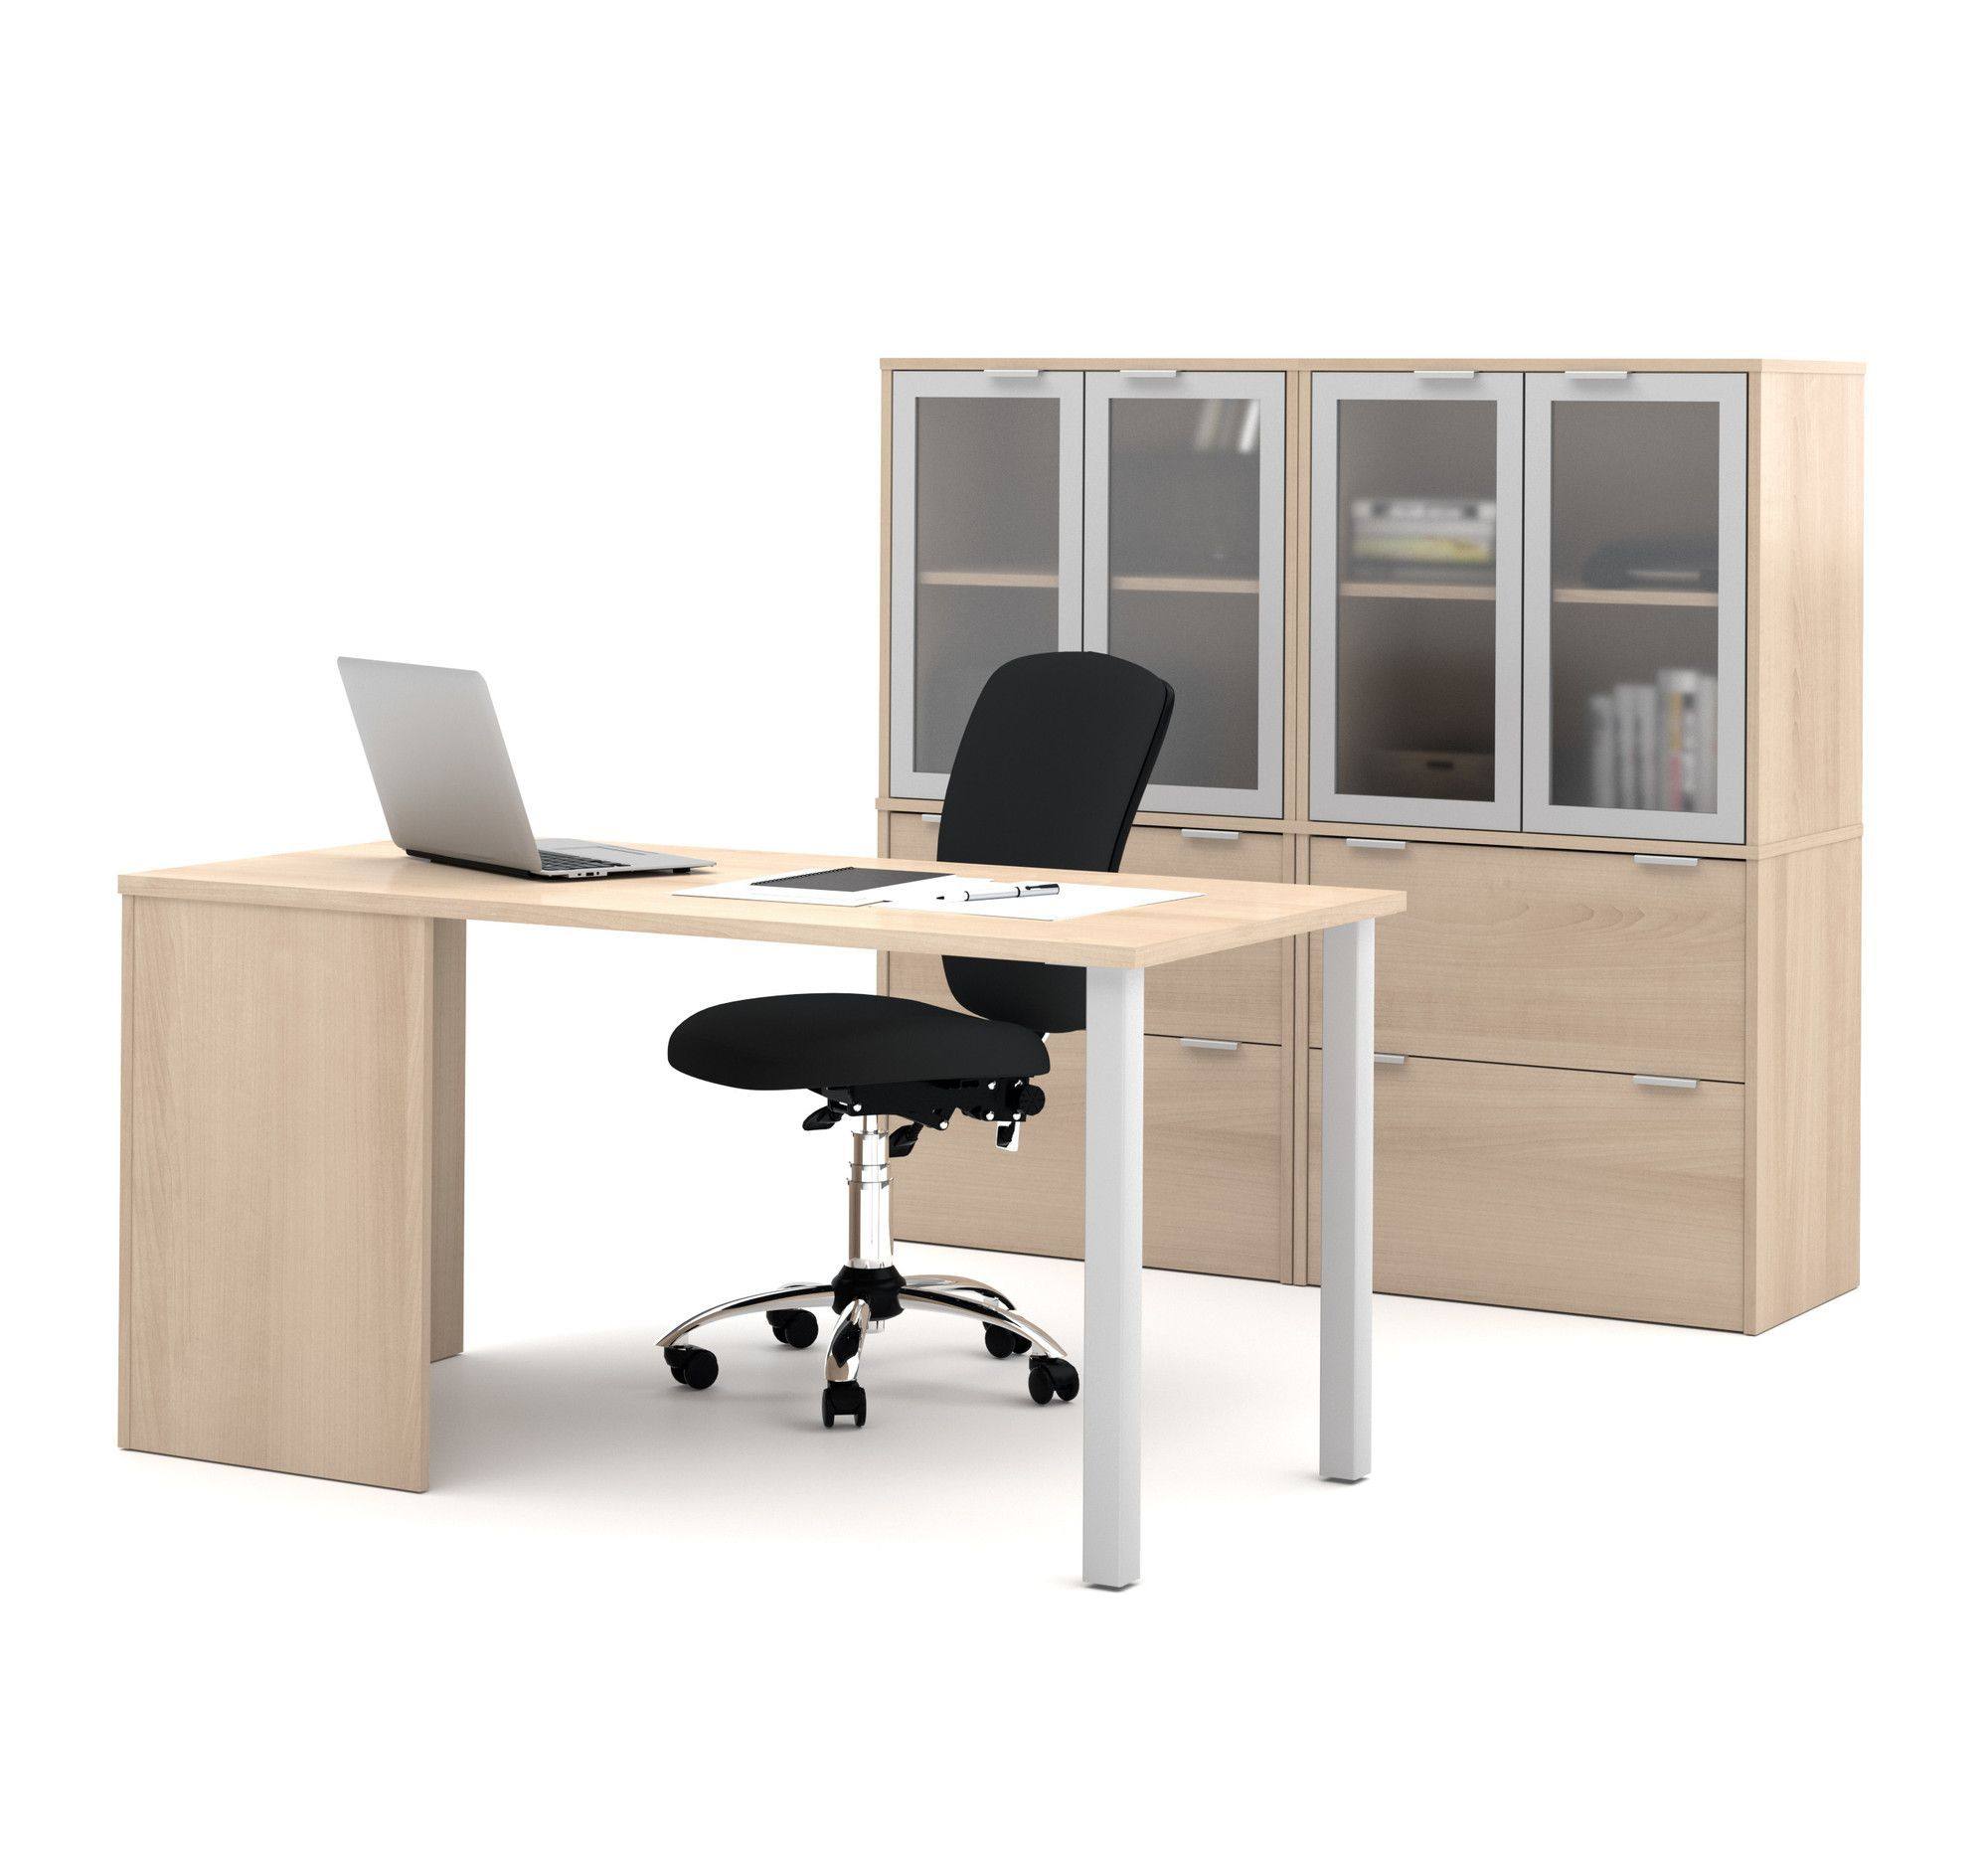 I3 3 Piece Standard Desk Office Suite   Products   Pinterest ...